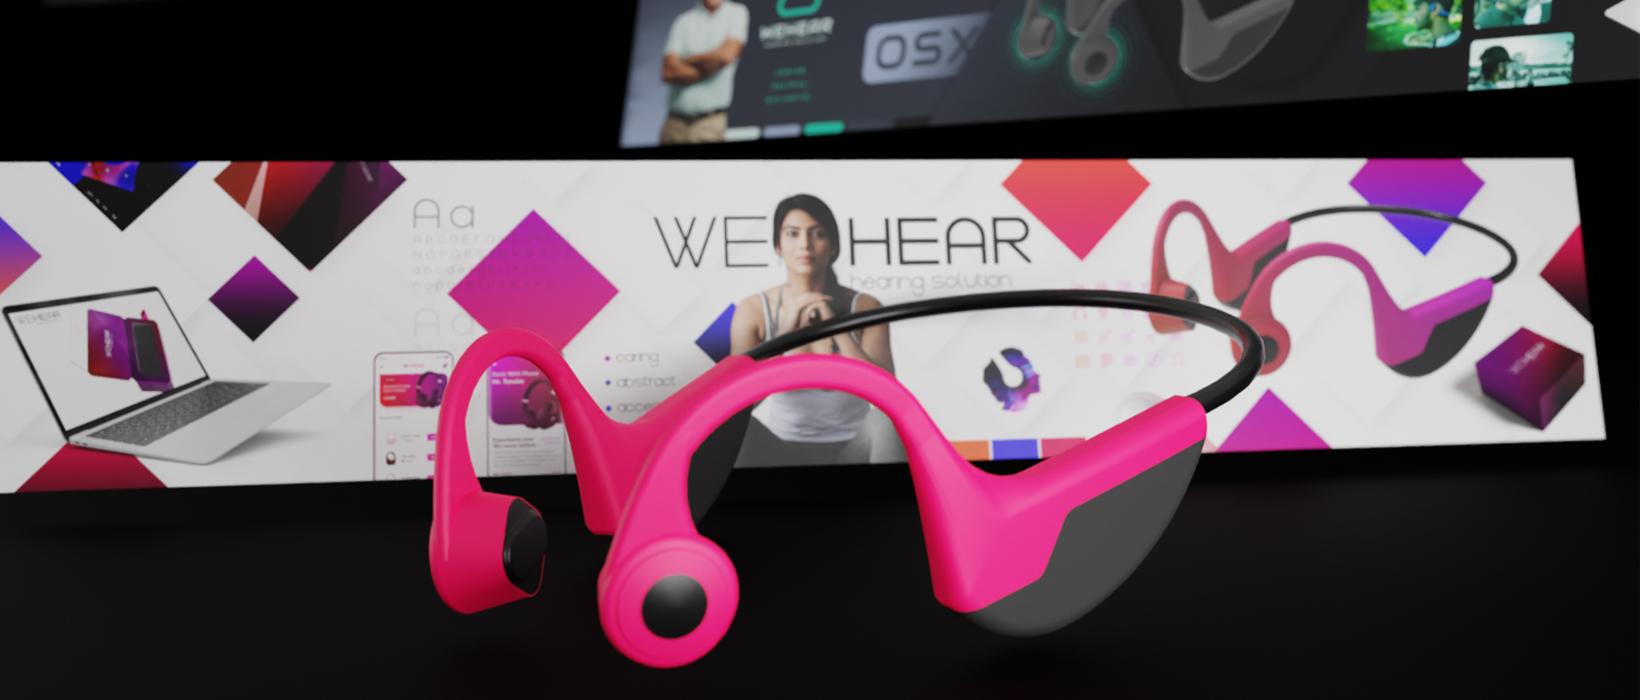 PulsAero developed strategic brand communication for WeHear